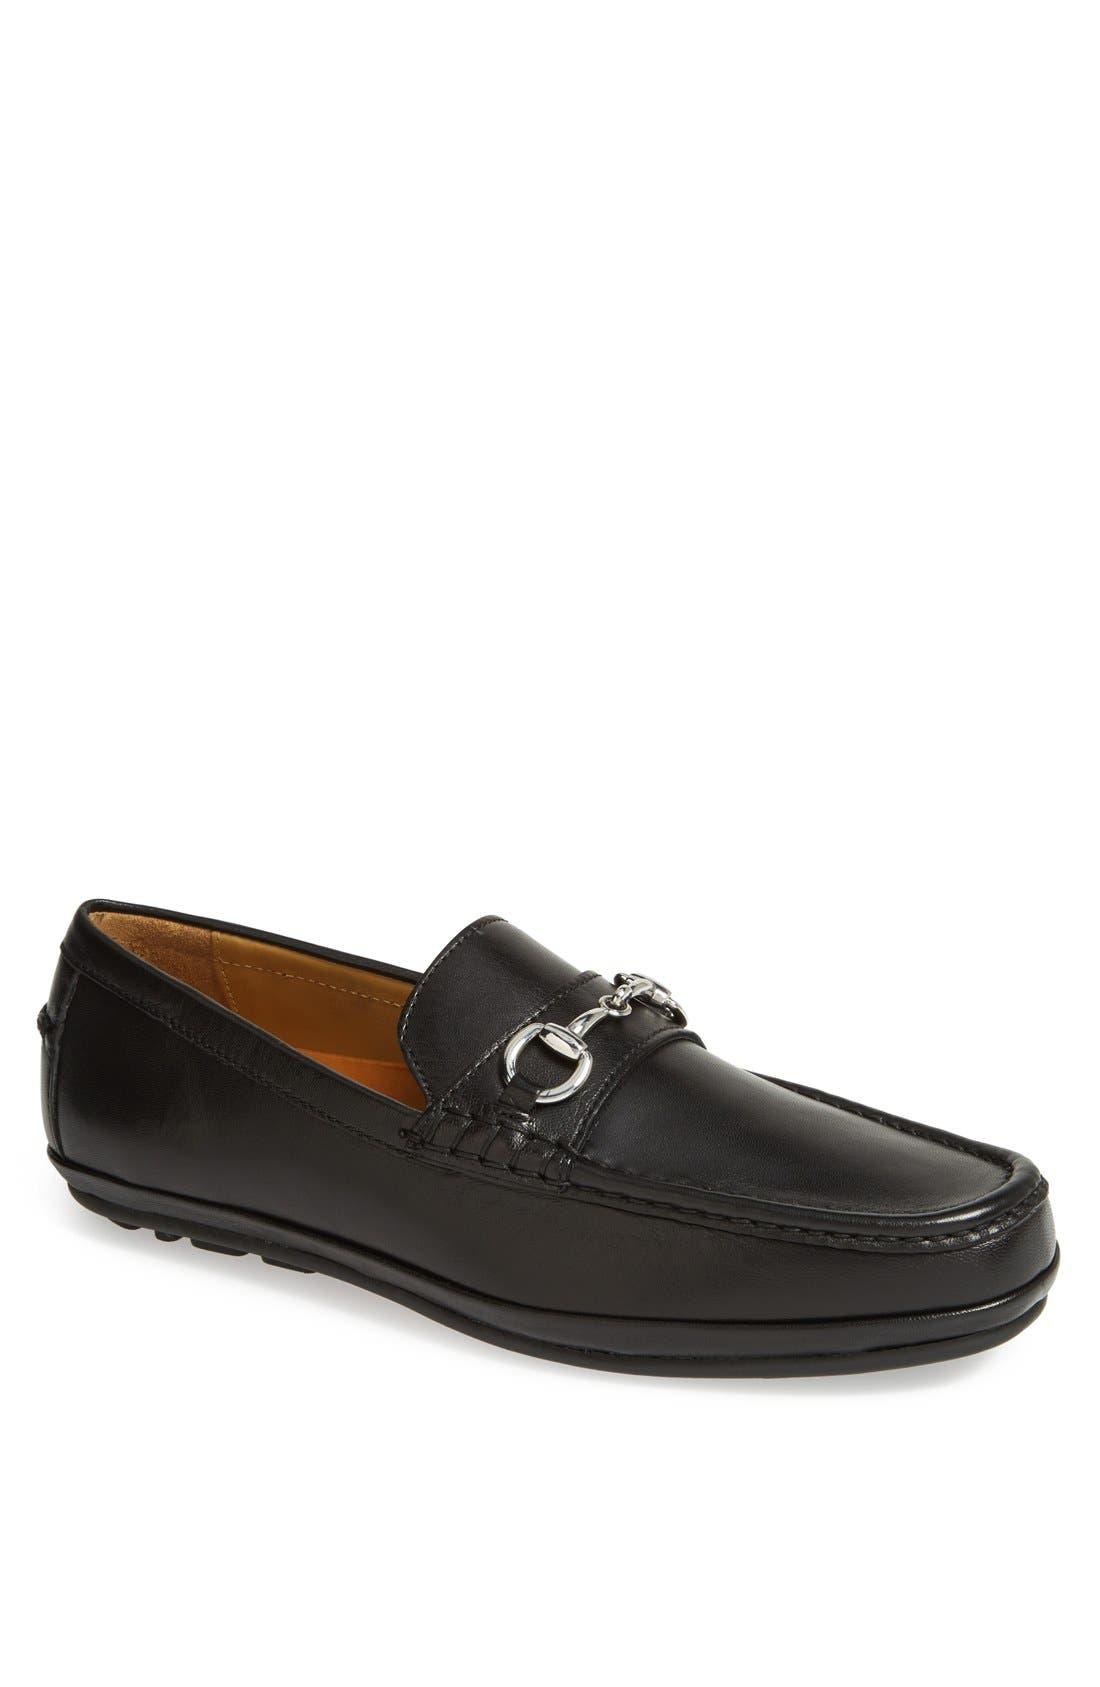 Alternate Image 1 Selected - Cole Haan 'Hudson' Driving Shoe (Men)